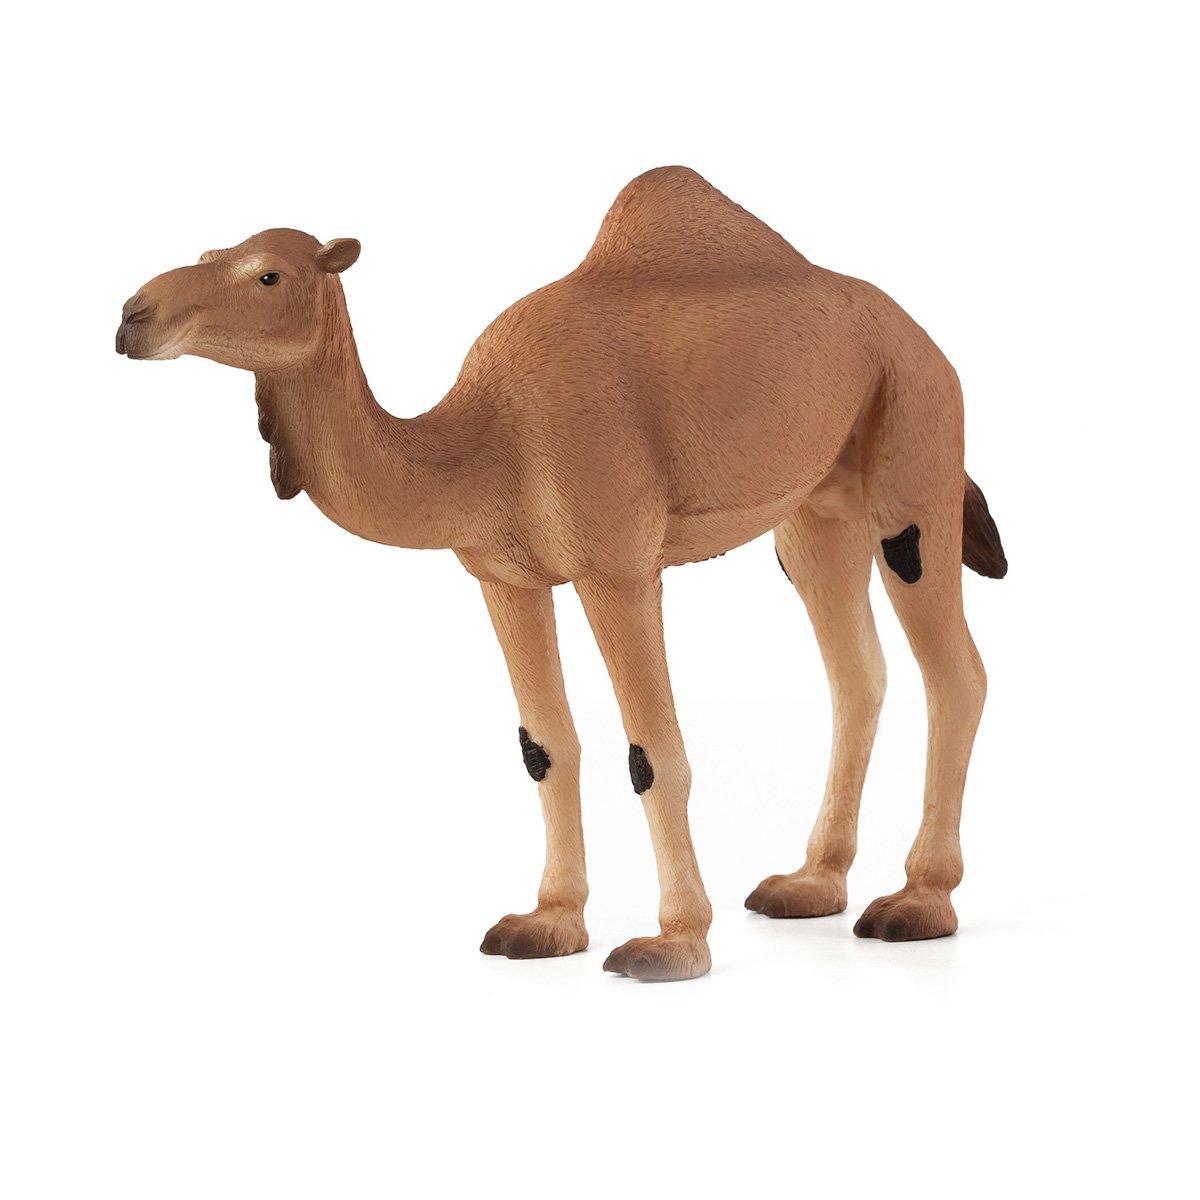 Figurina Mojo, Camila Araba imagine 2021